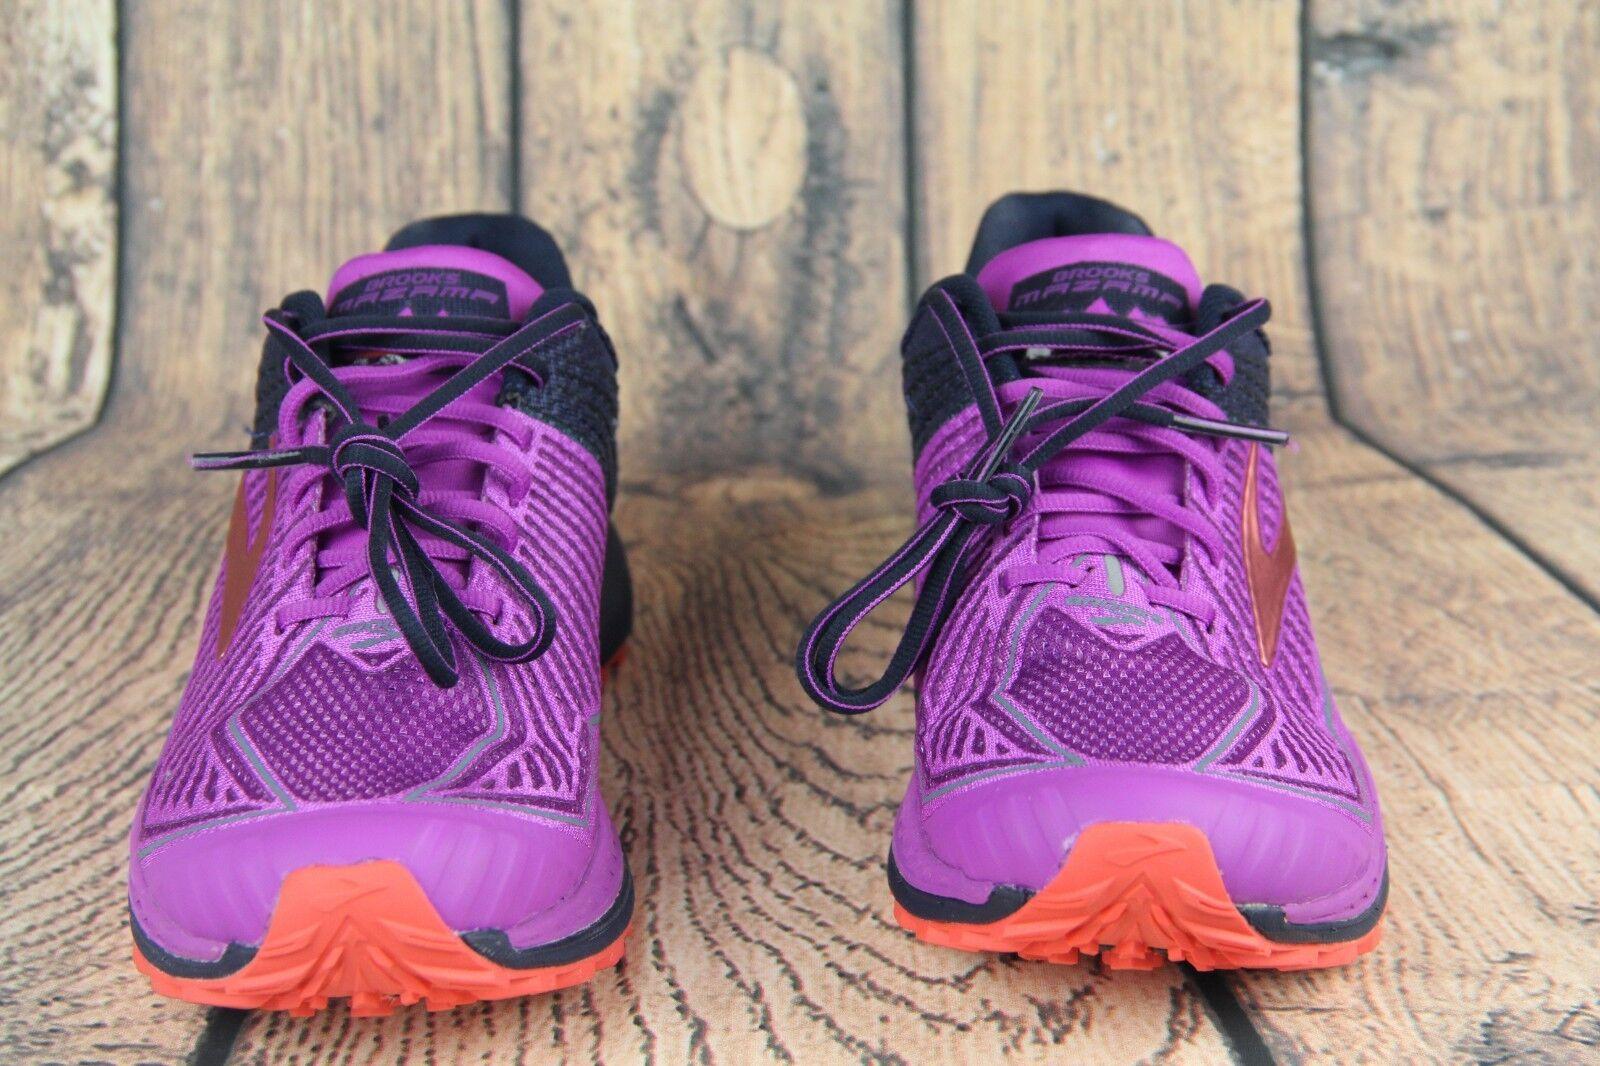 4d93d99b53b Brooks Mazama Purple Orange Navy Trail Running Shoes 1202271 B596 ...